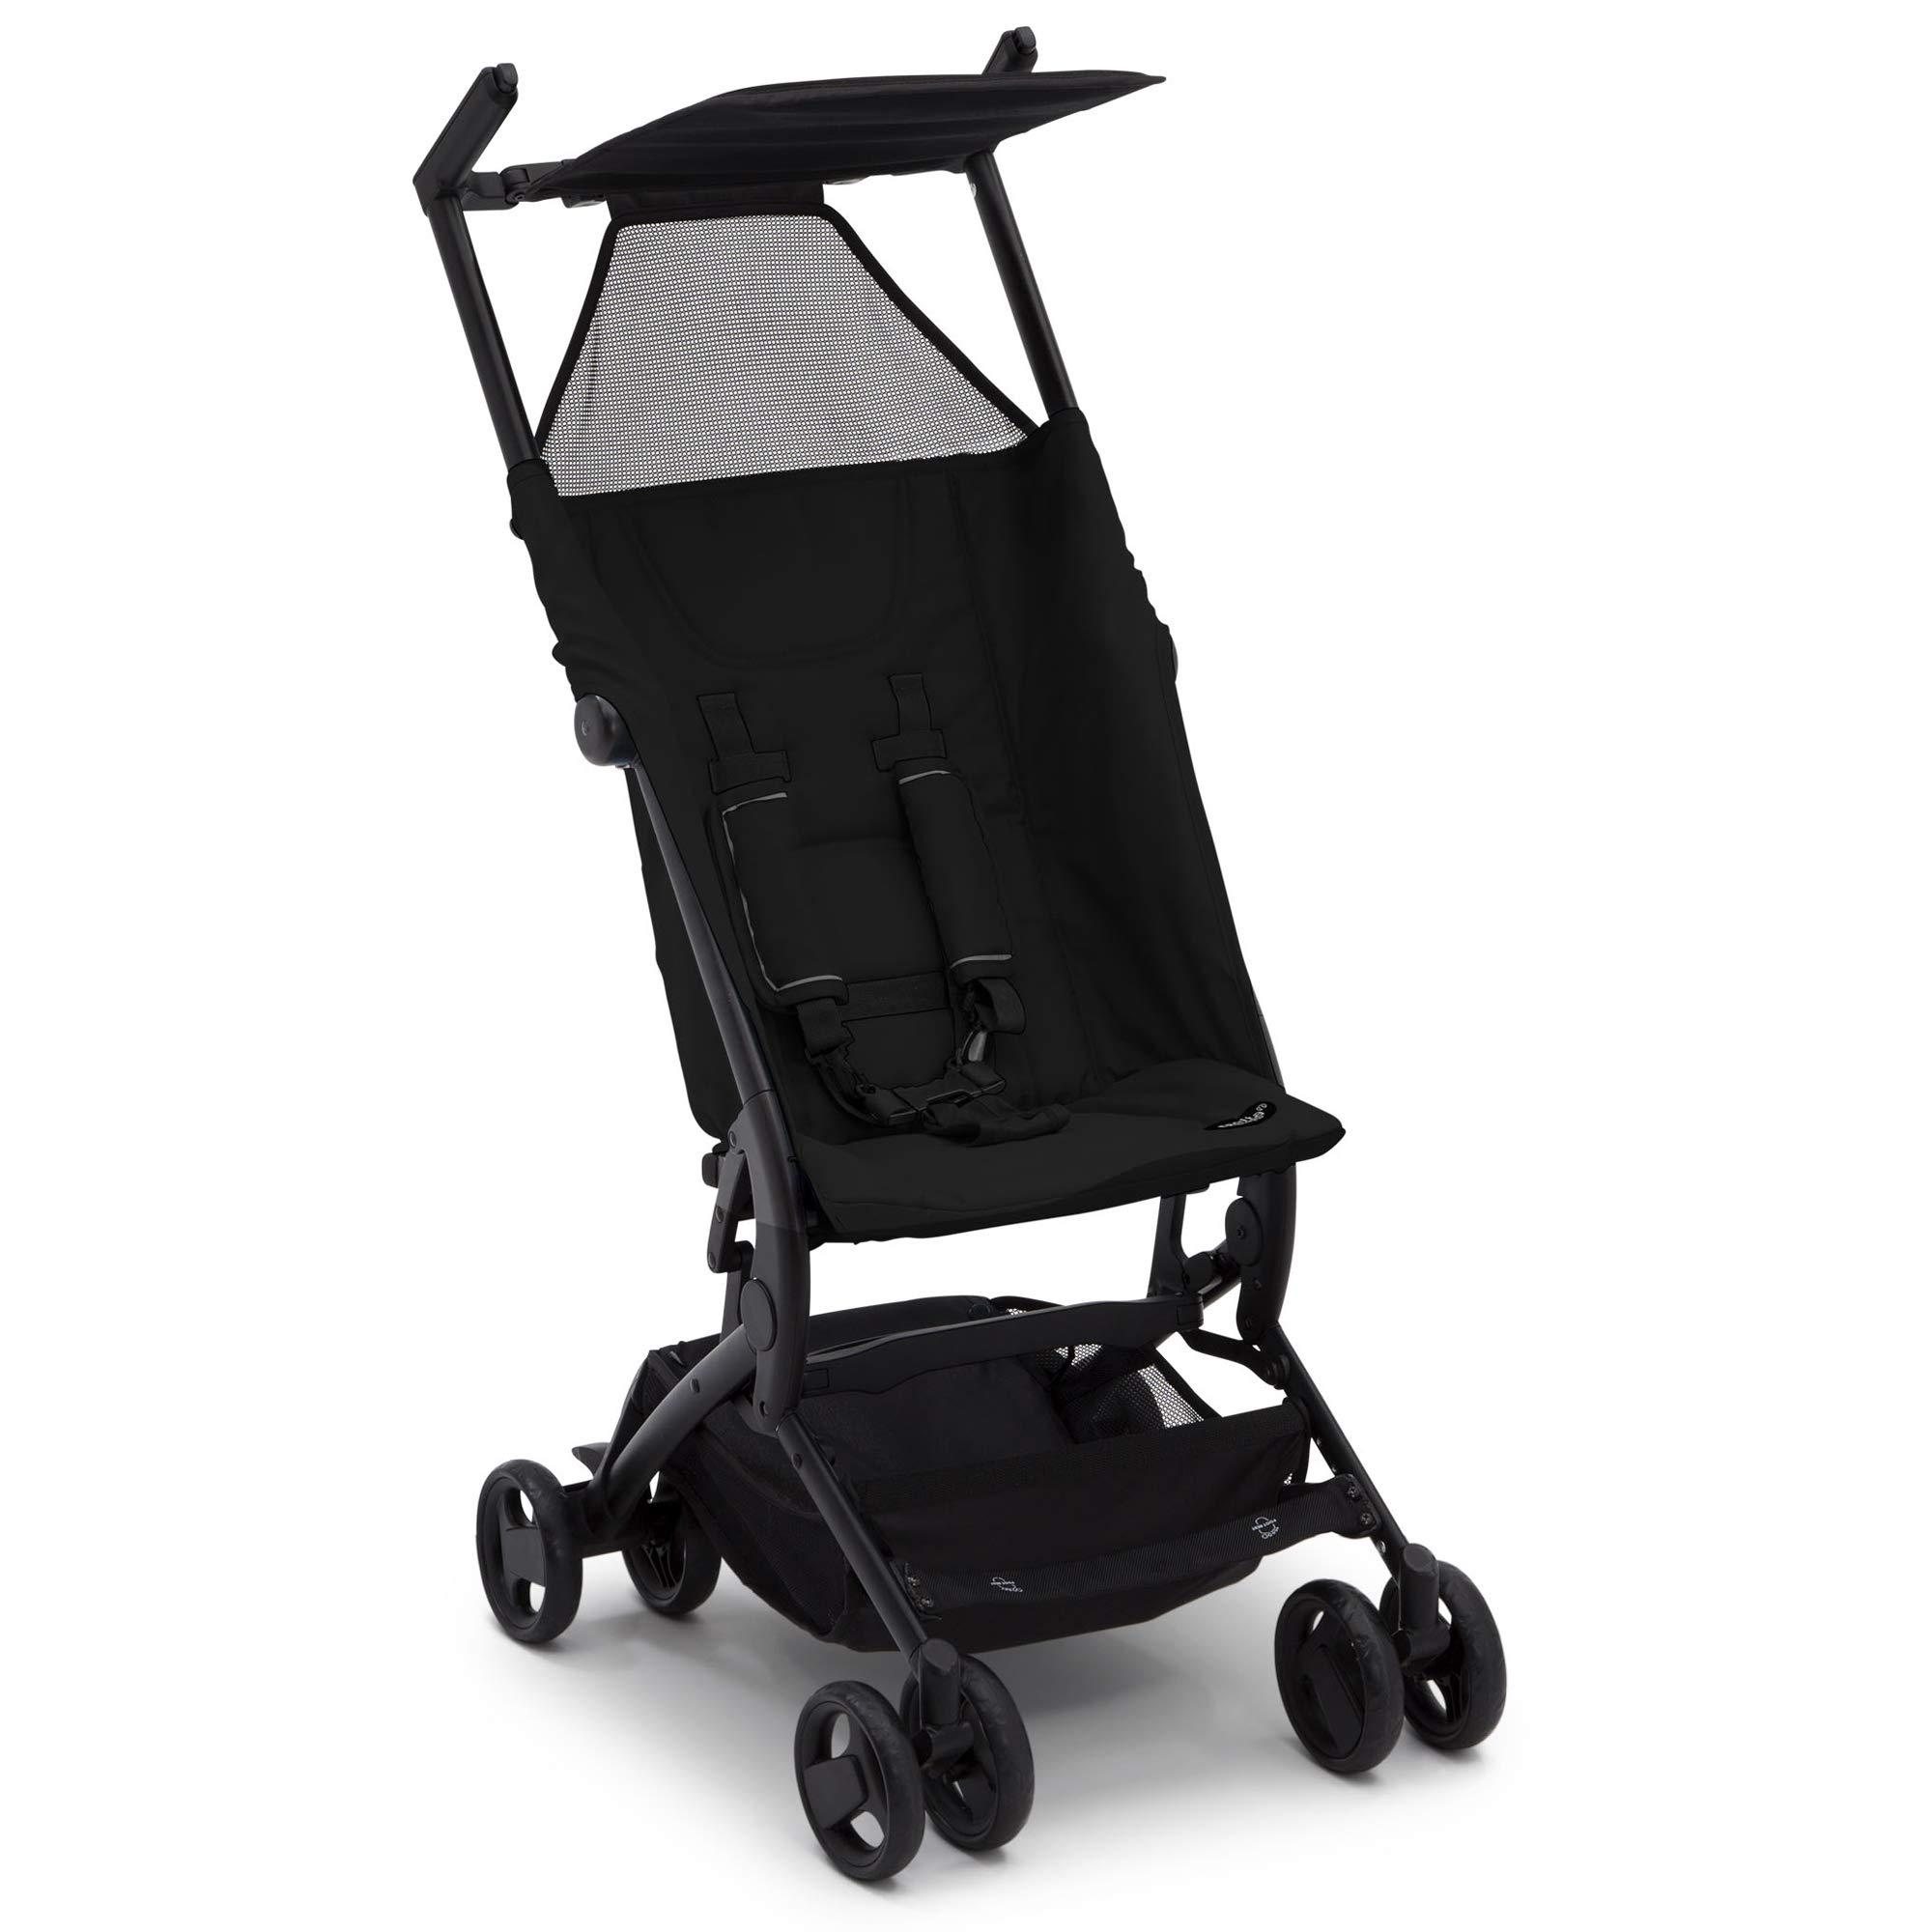 The Clutch Stroller by Delta Children - Lightweight Compact Folding Stroller - Includes Travel Bag - Fits Airplane Overhead Storage - Black by Delta Children (Image #2)